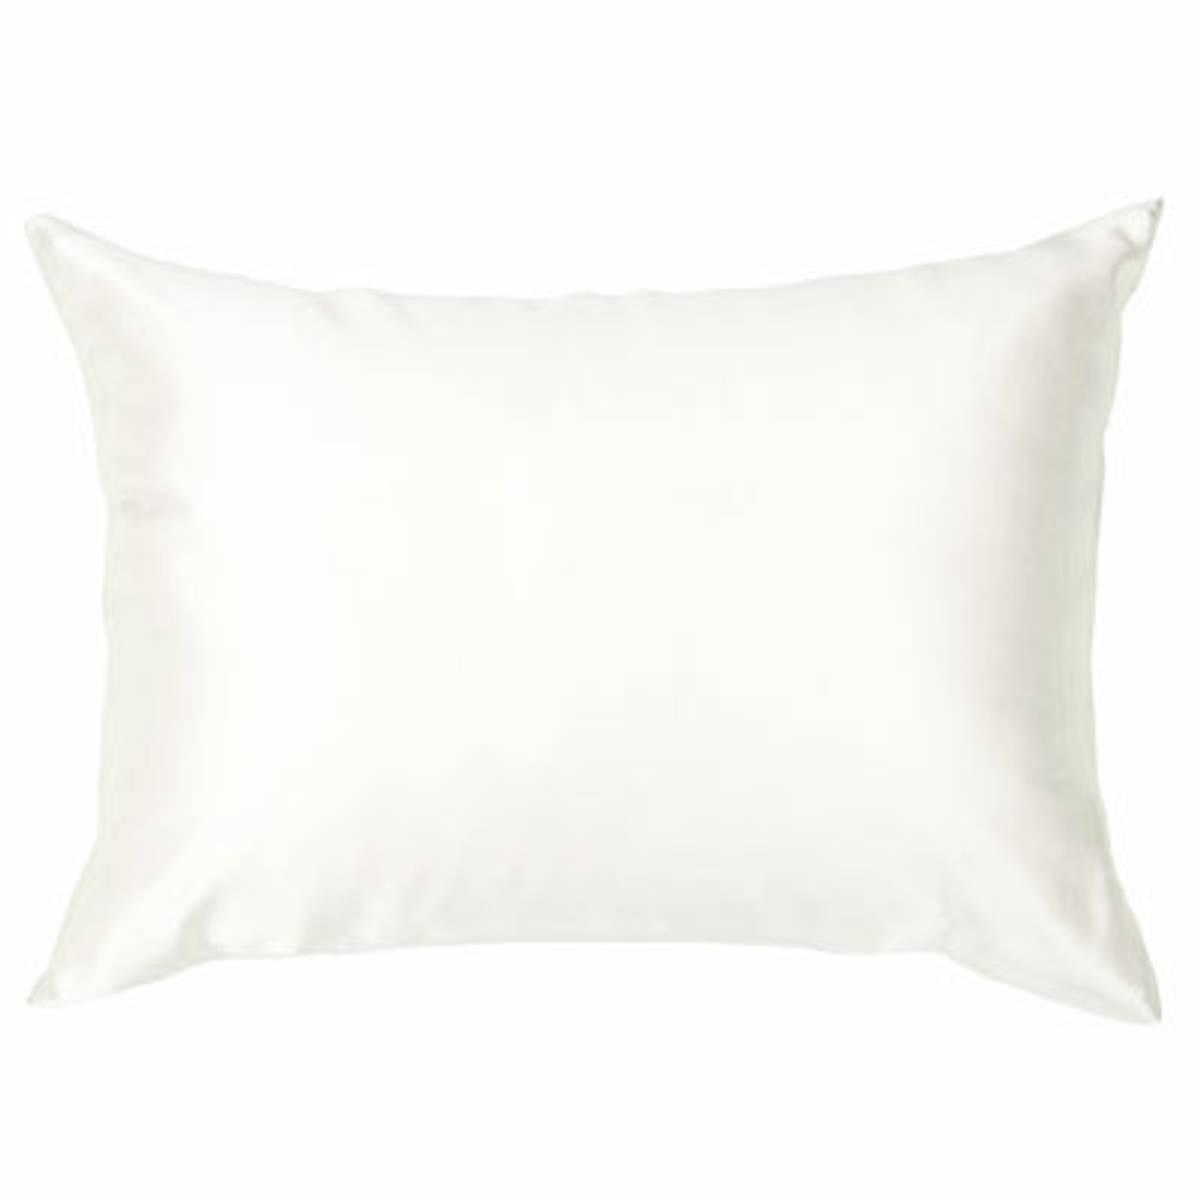 Silkeputetrekk - XL - hvit